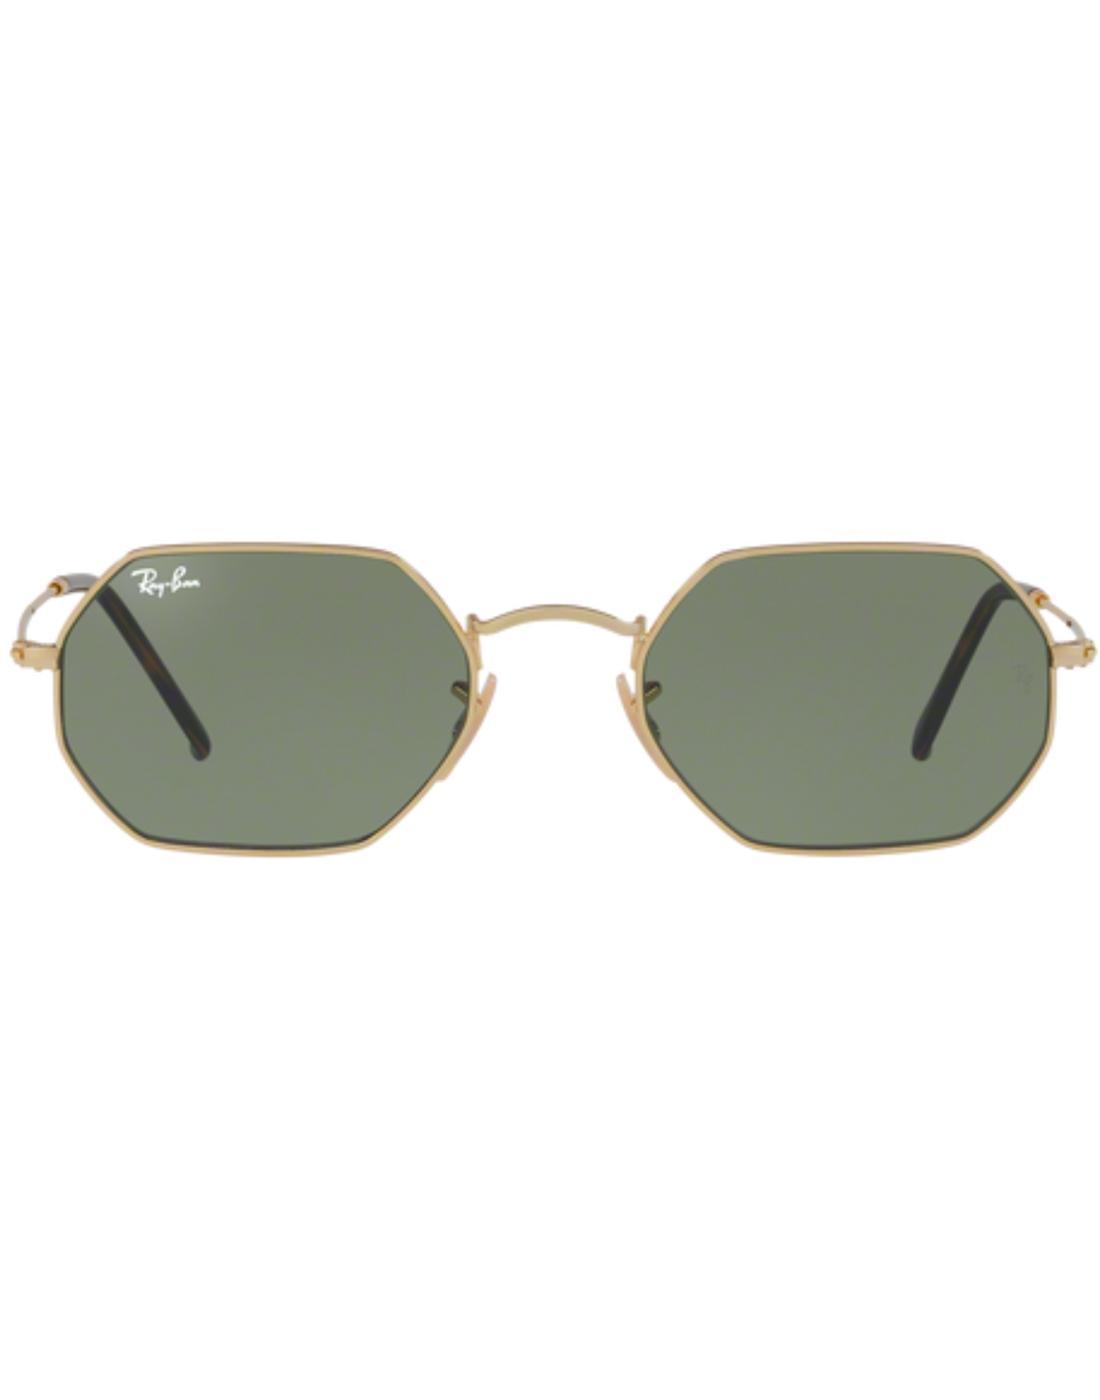 RAY-BAN Retro 60s Octagon Shaped Sunglasses -Green